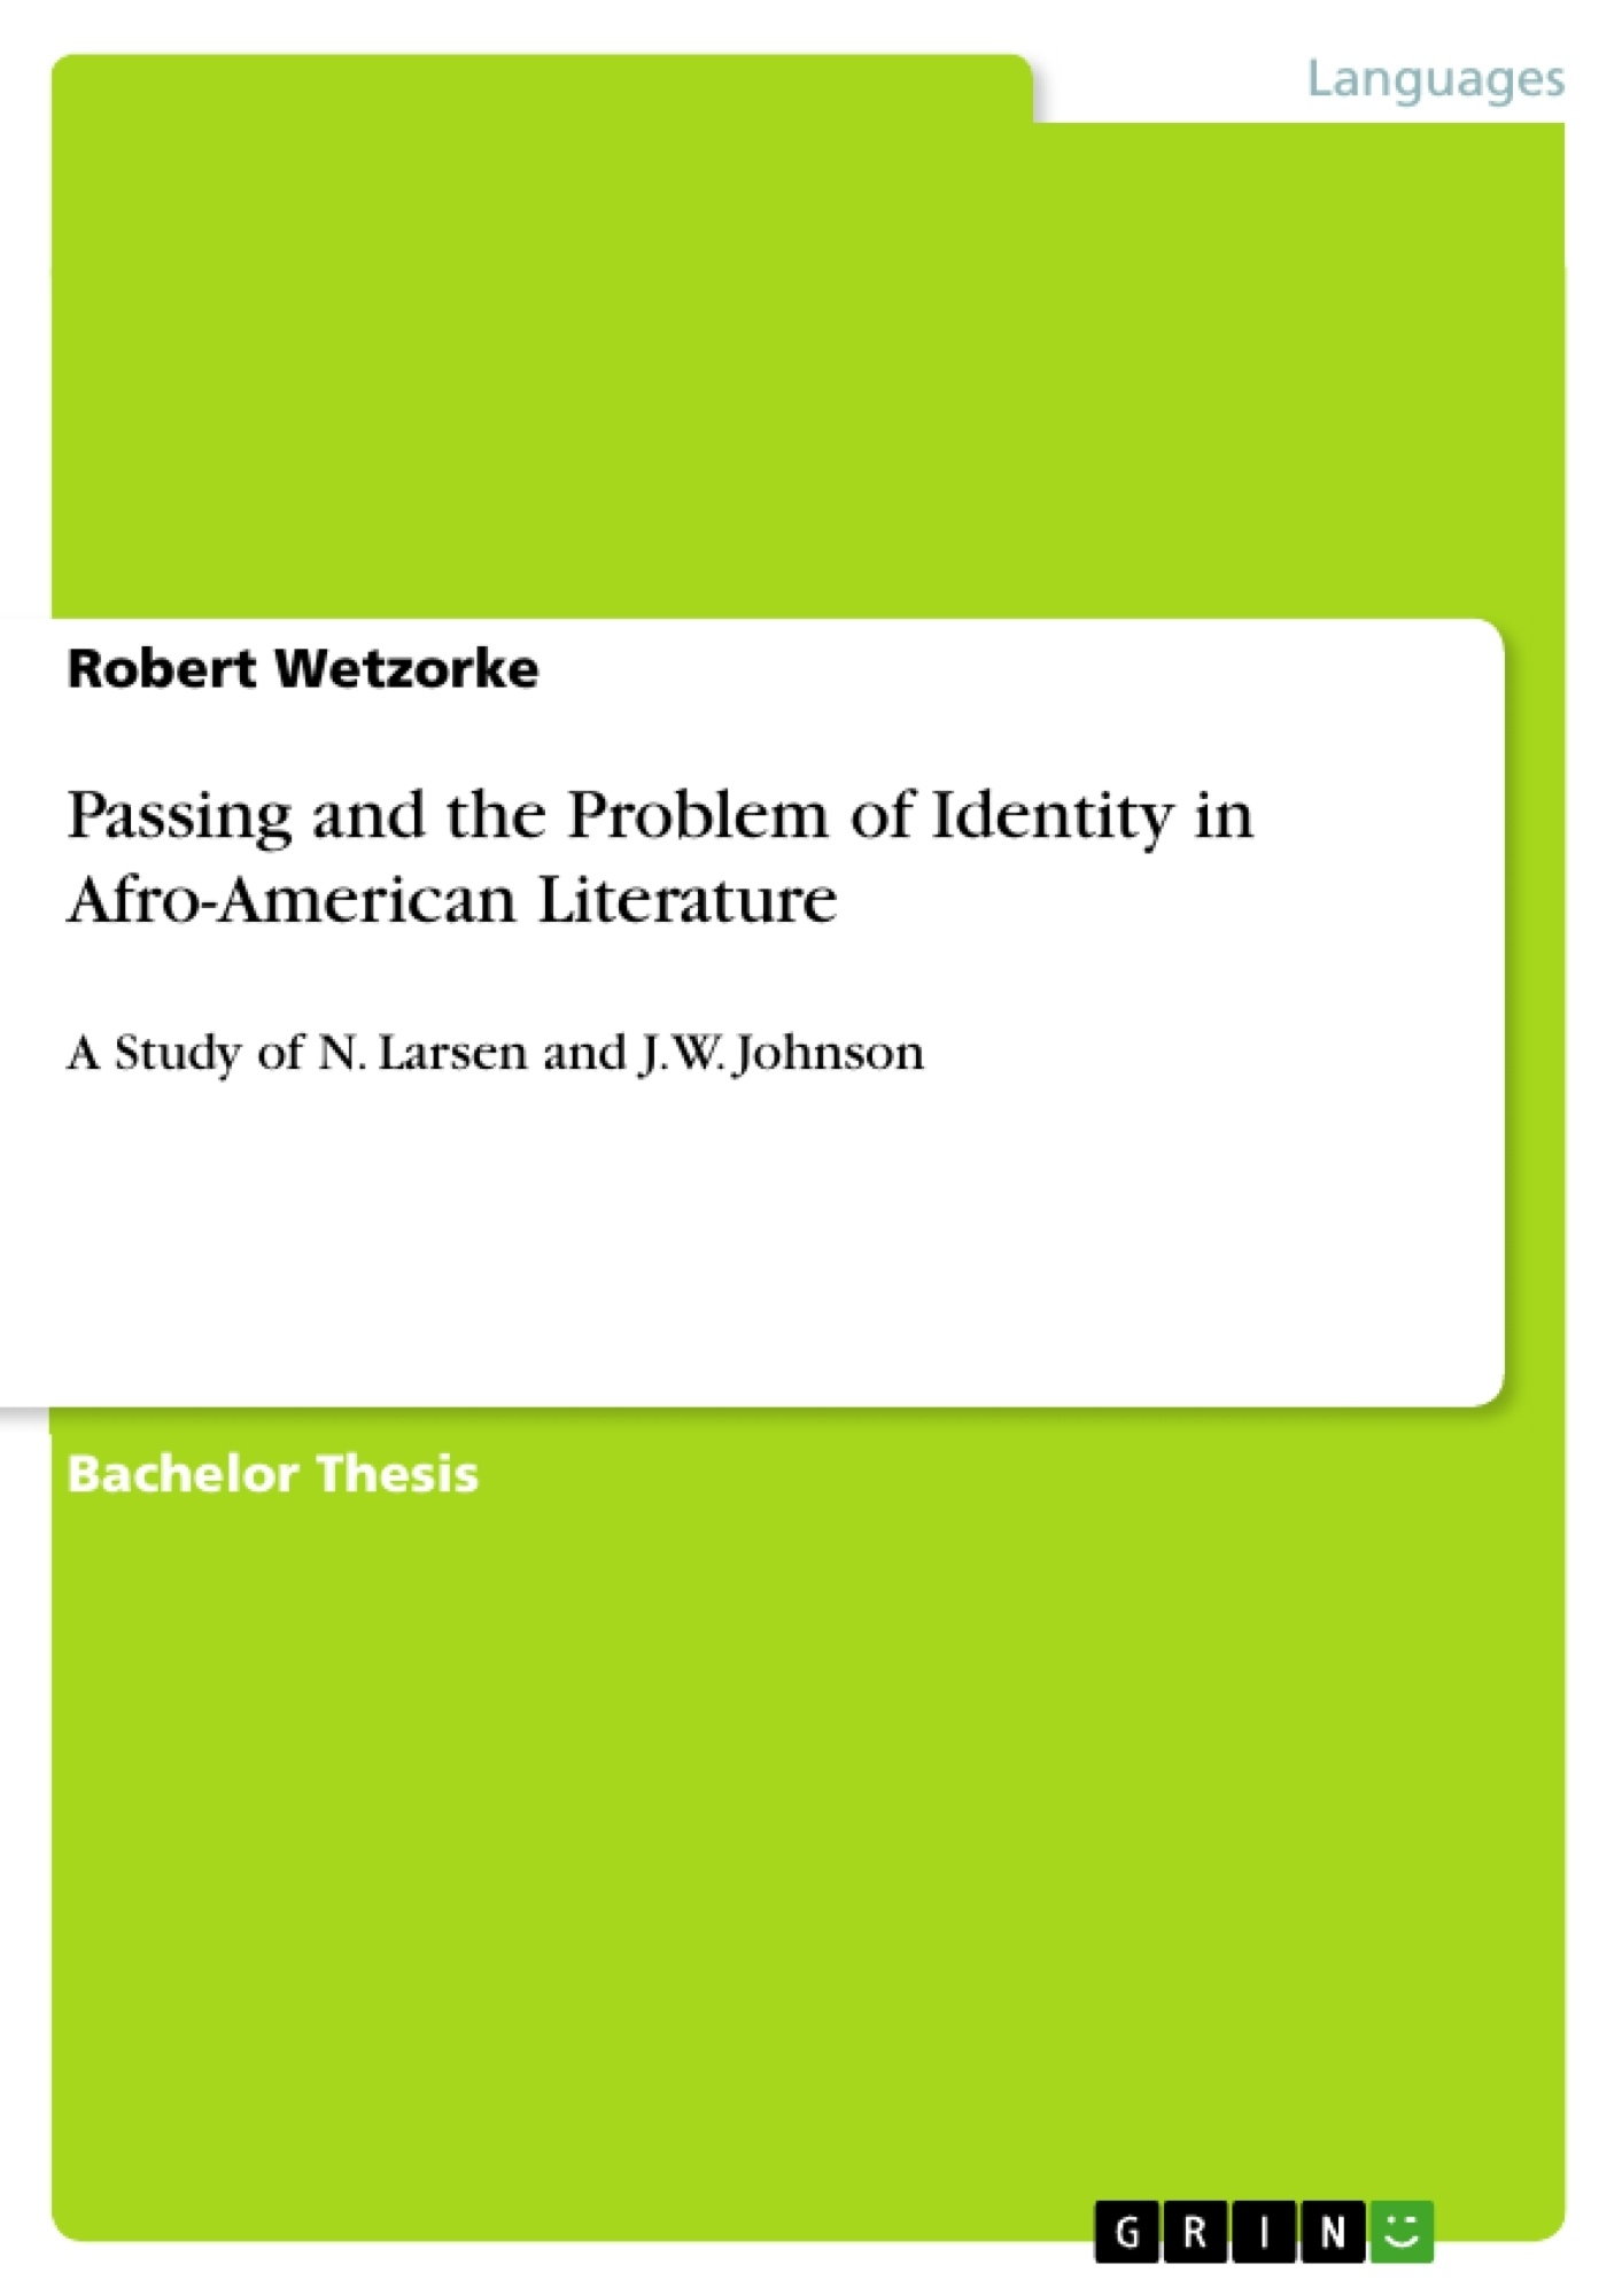 belonging thesis on identity